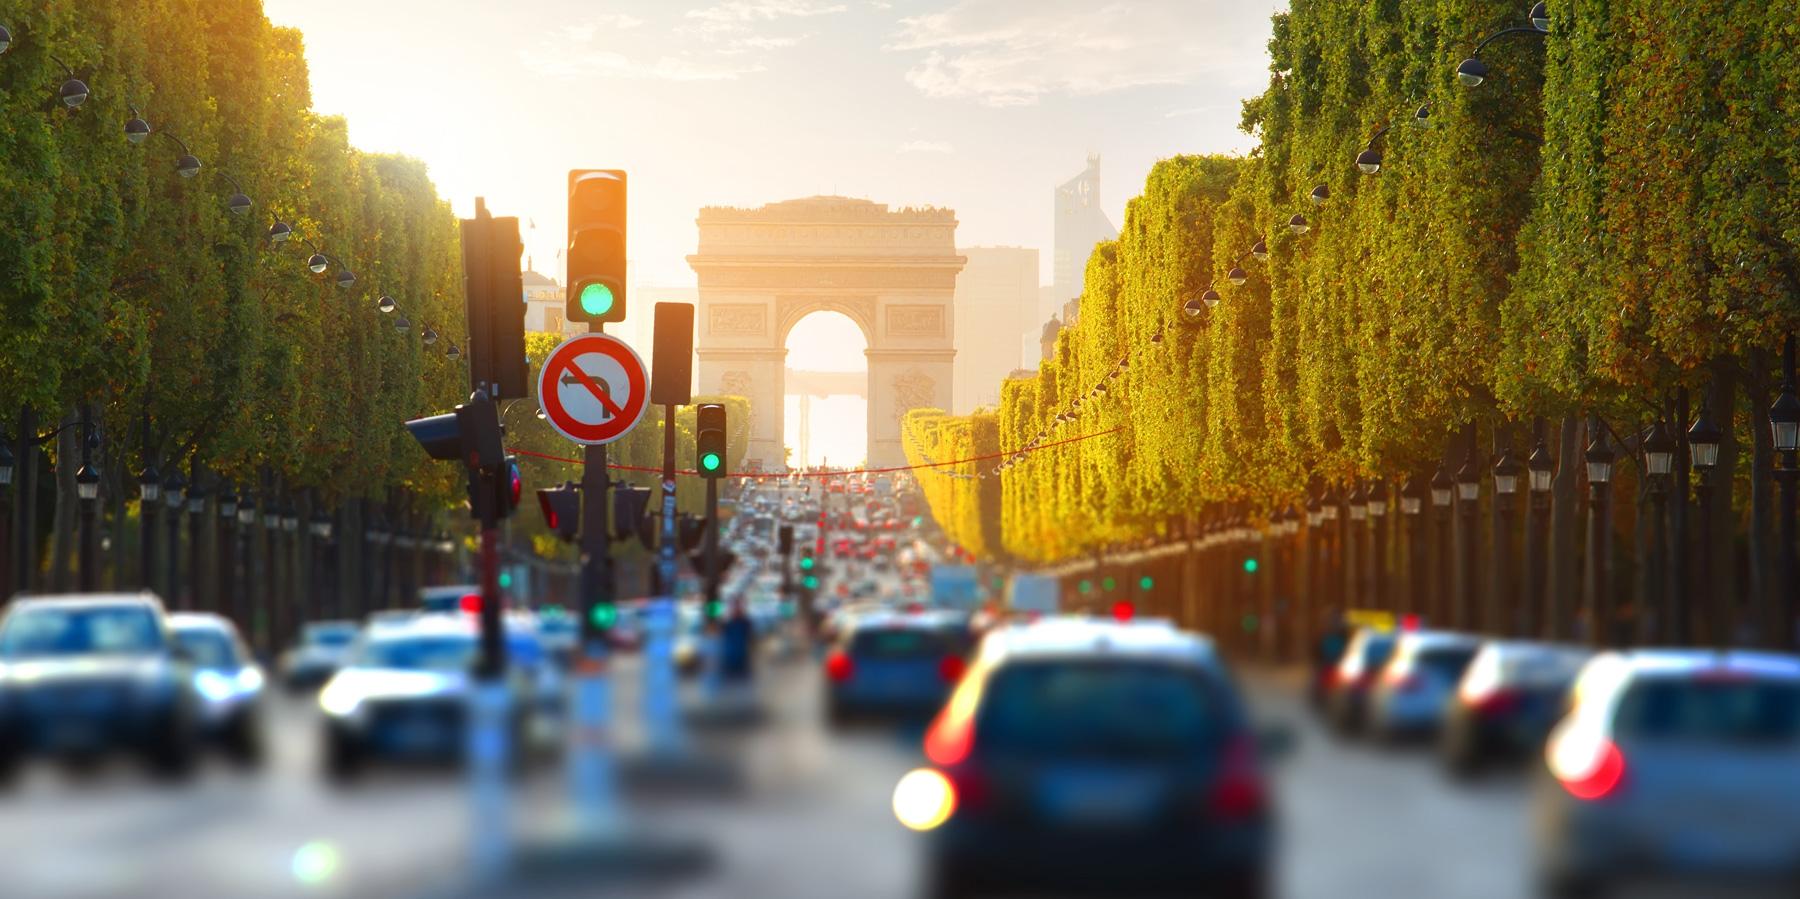 SM_traffic-on-champs-elysee_1800px.jpg